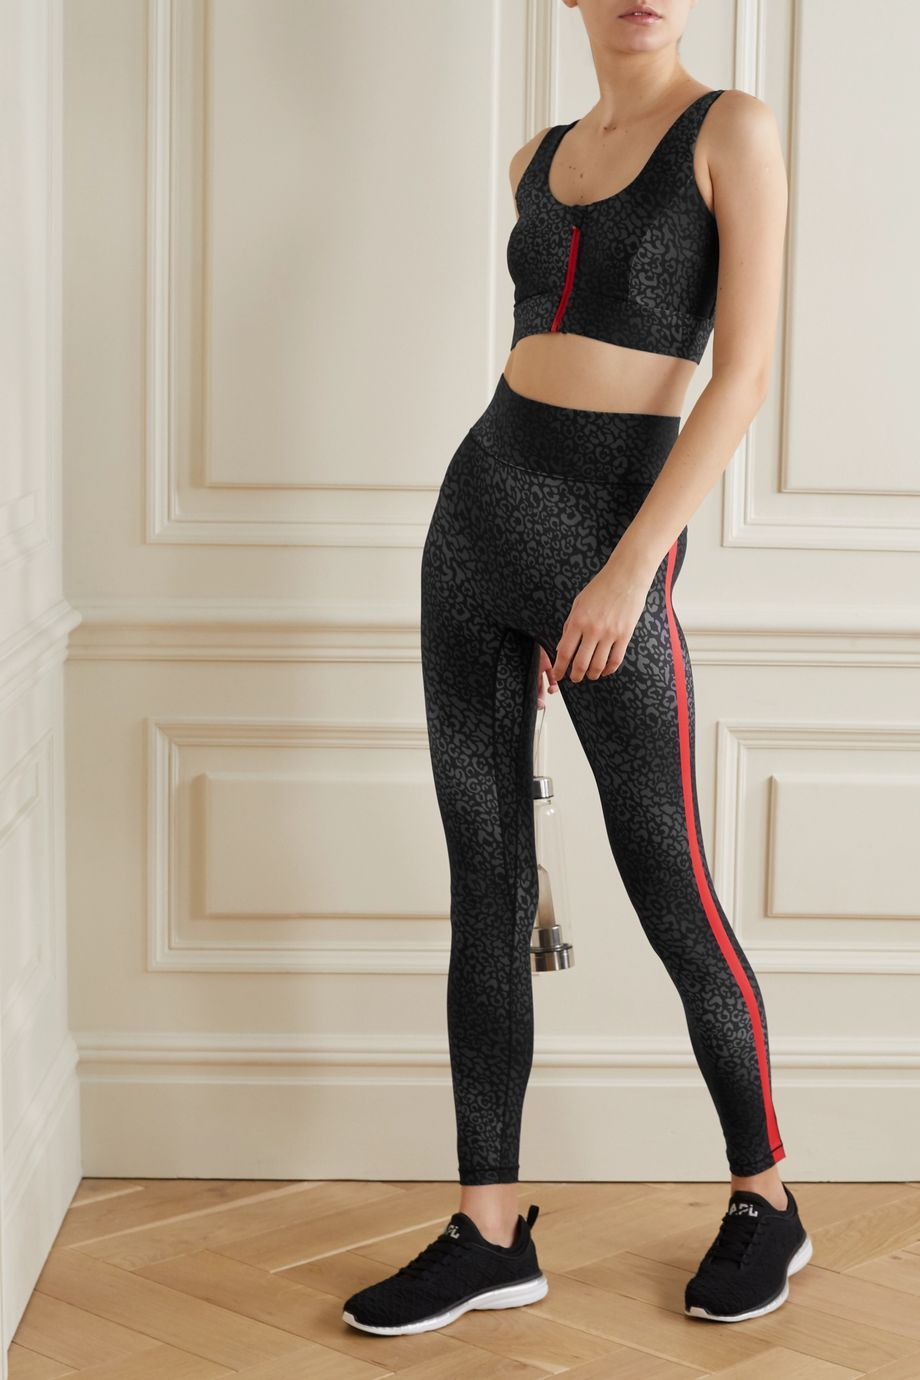 All Access Audio printed stretch leggings